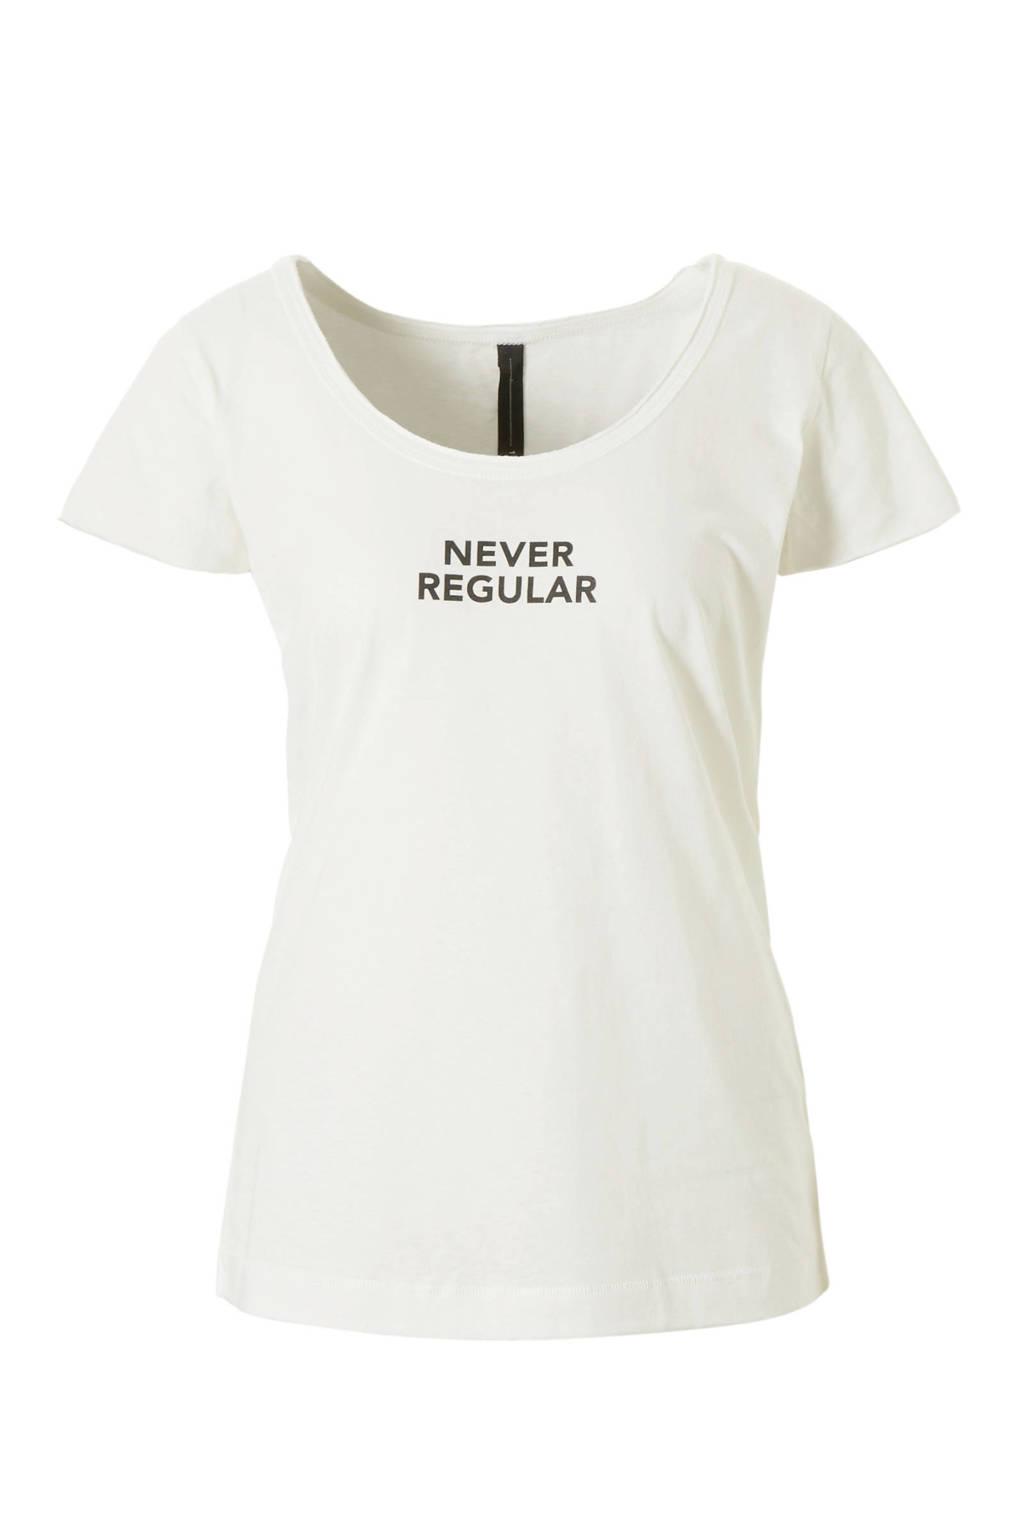 10DAYS T-shirt met printopdruk, Wit